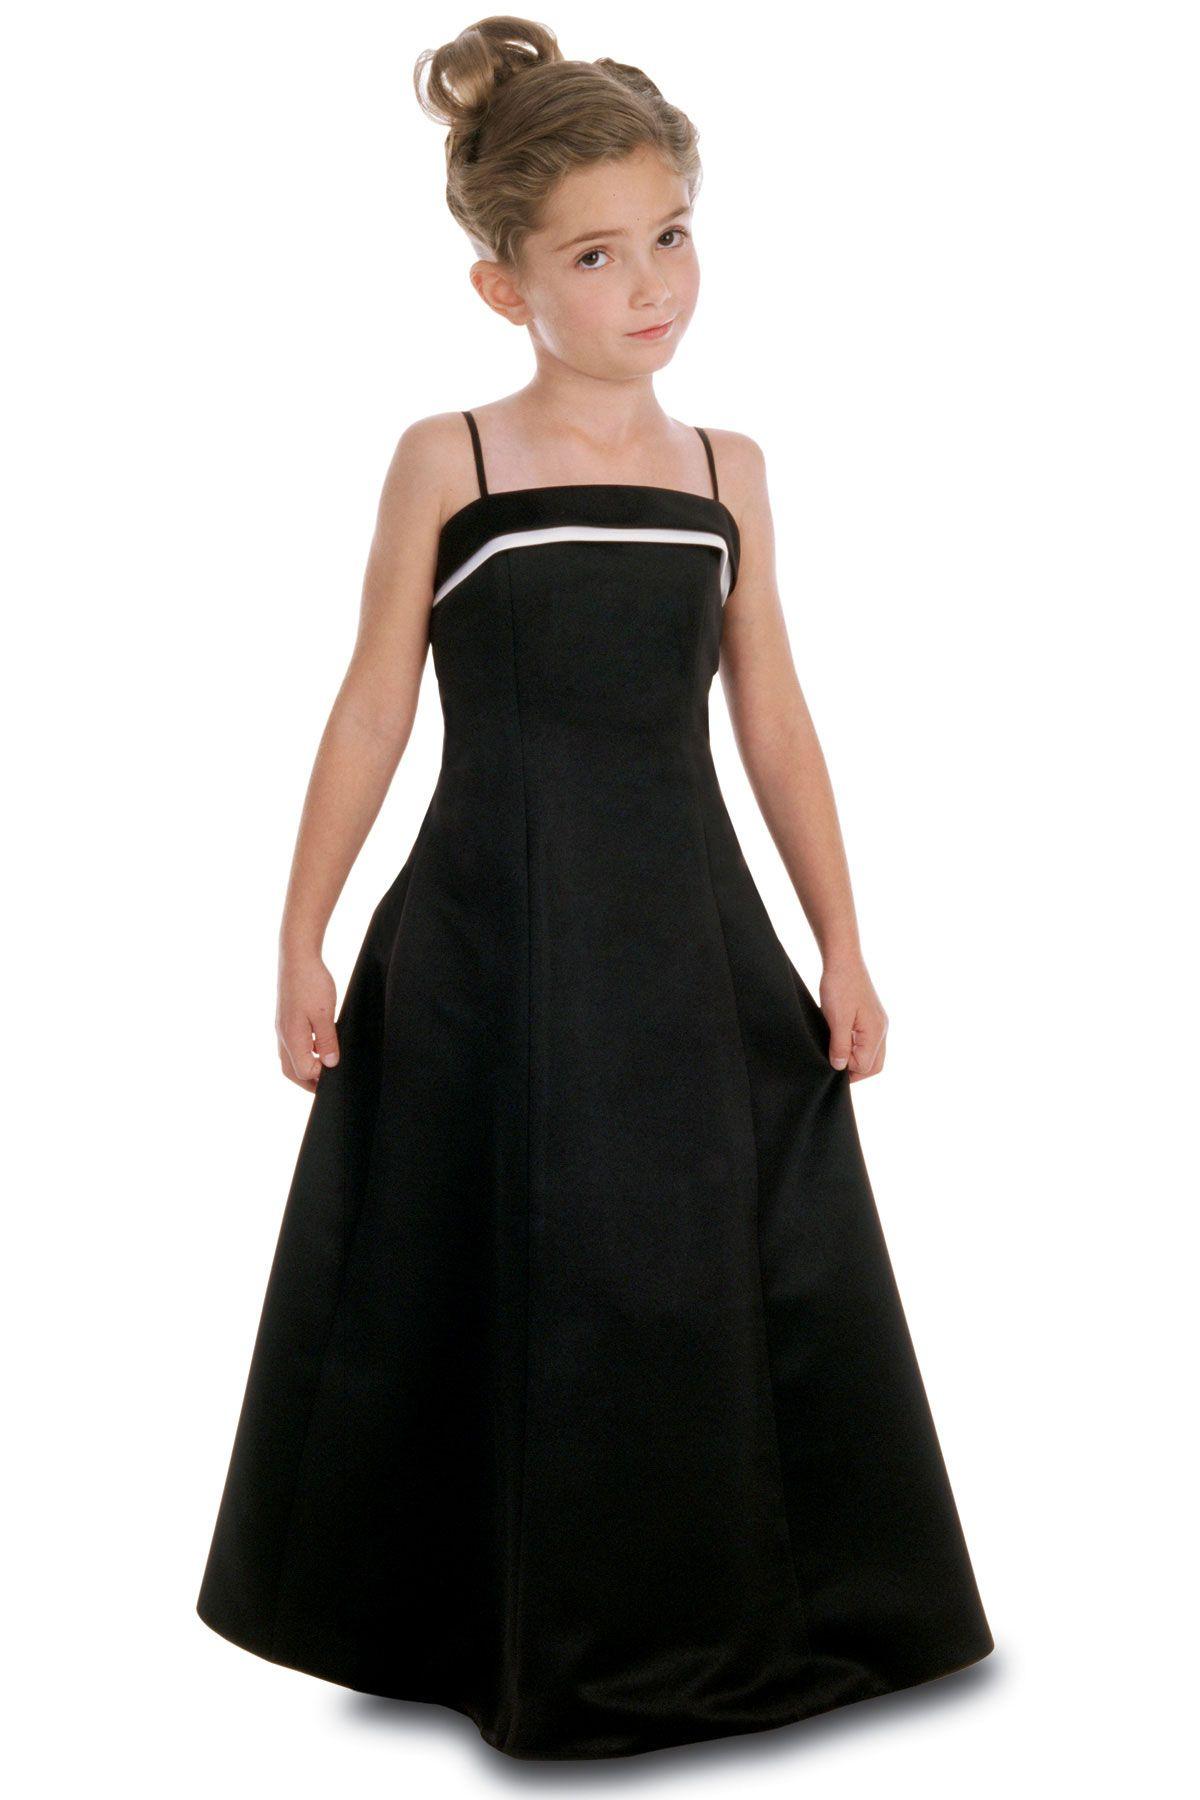 Satin aline style junior bridesmaid dress by alexia designs